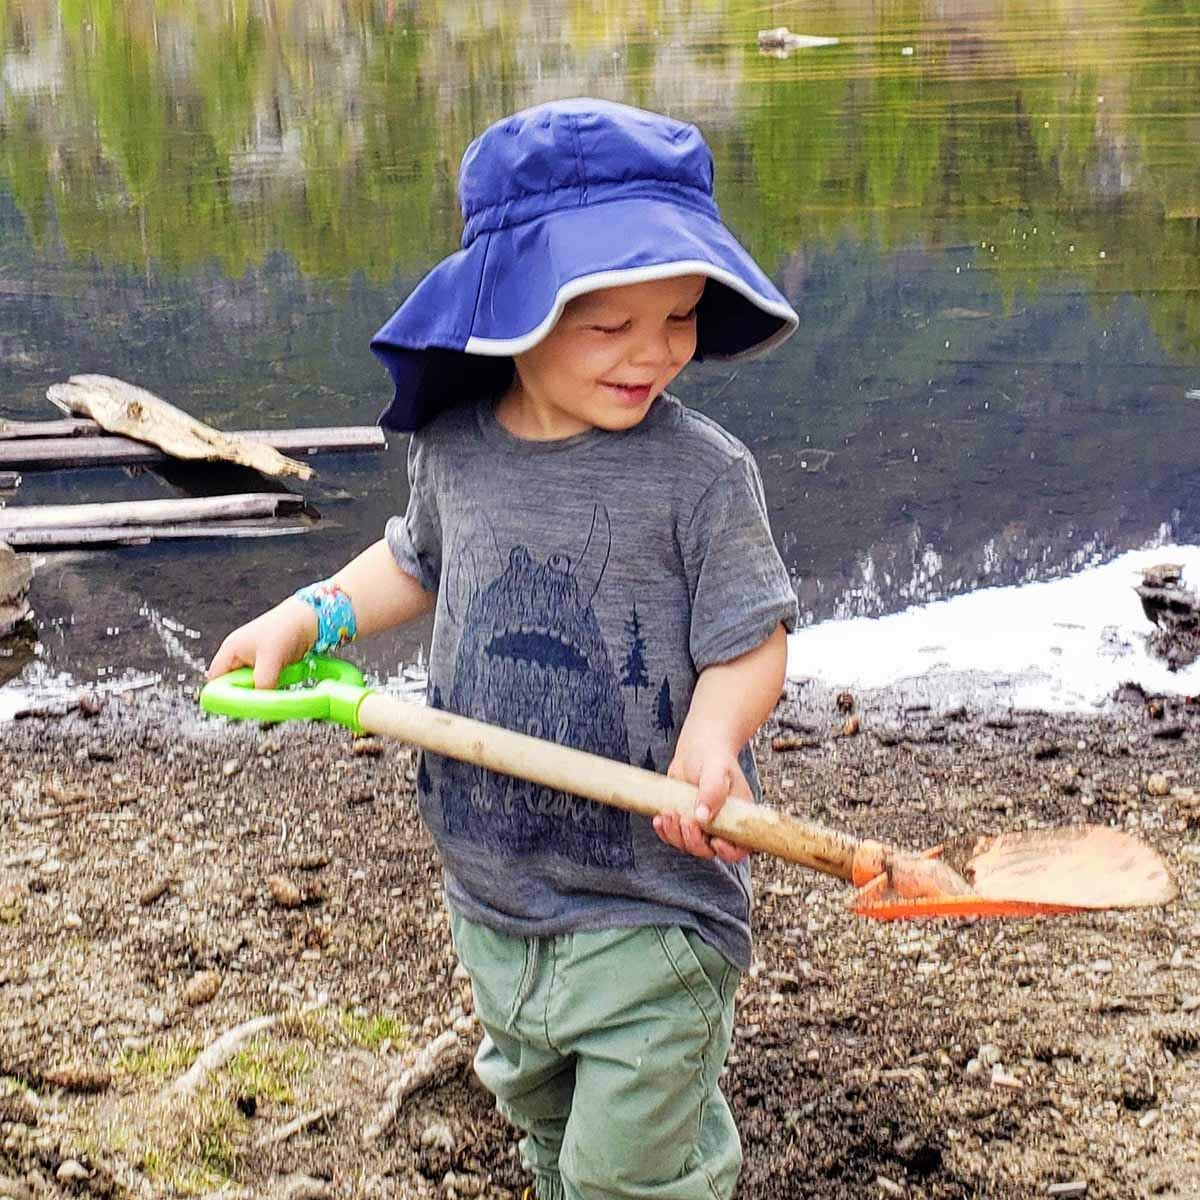 50+ UPF for Baby and Toddler Girl or Boy Jan /& Jul Kids Cotton Adventure Sun-Hat Adjustable Straps